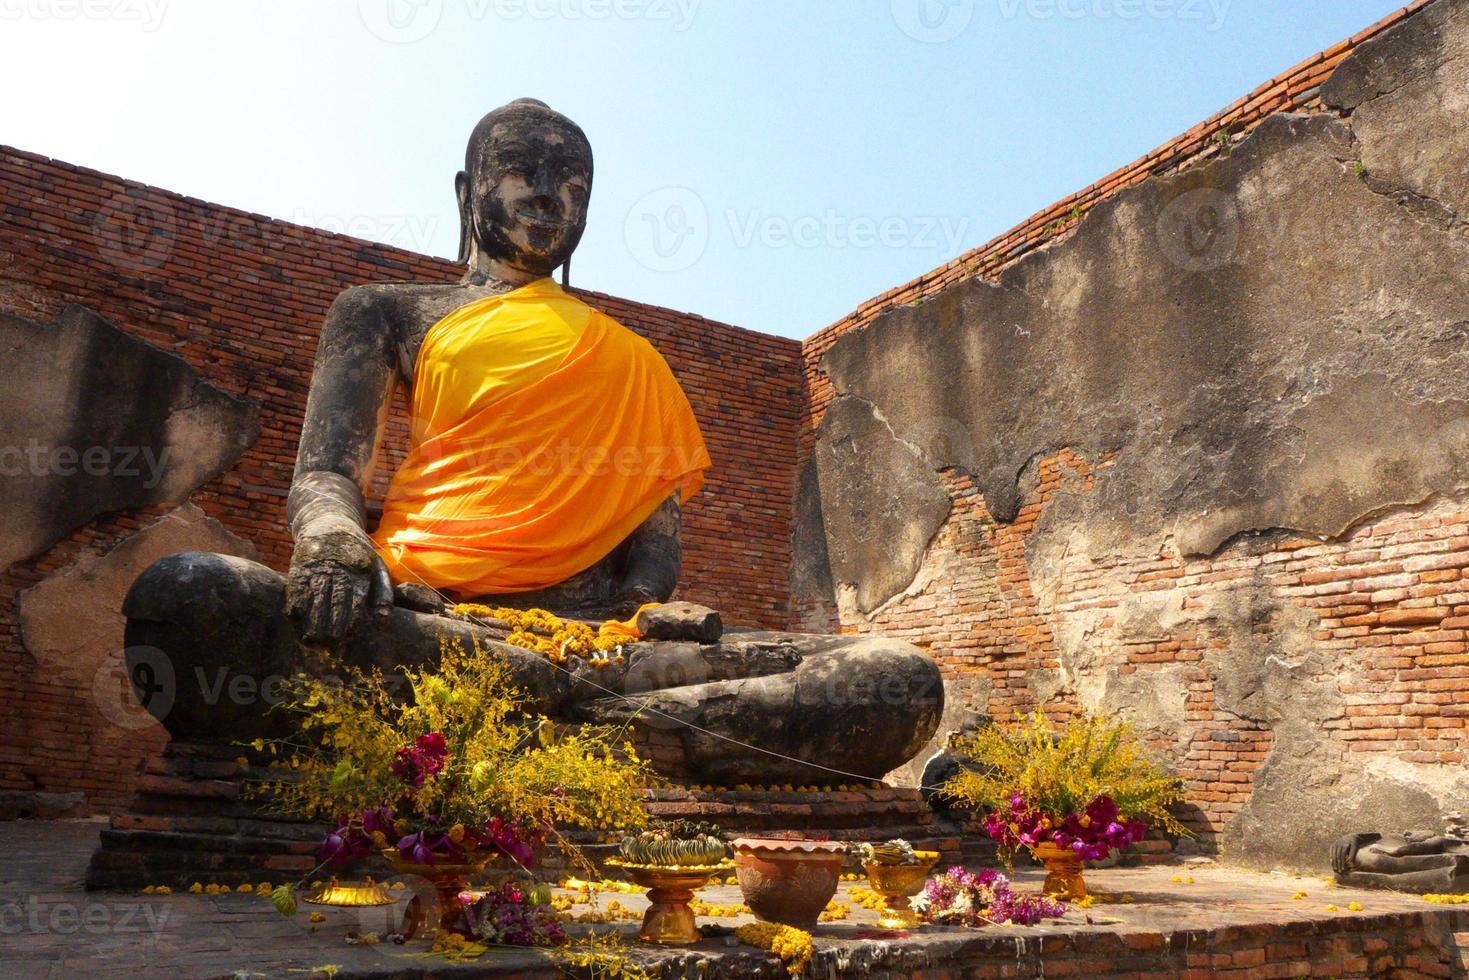 statue de bouddha à ayuddhaya thaïlande photo